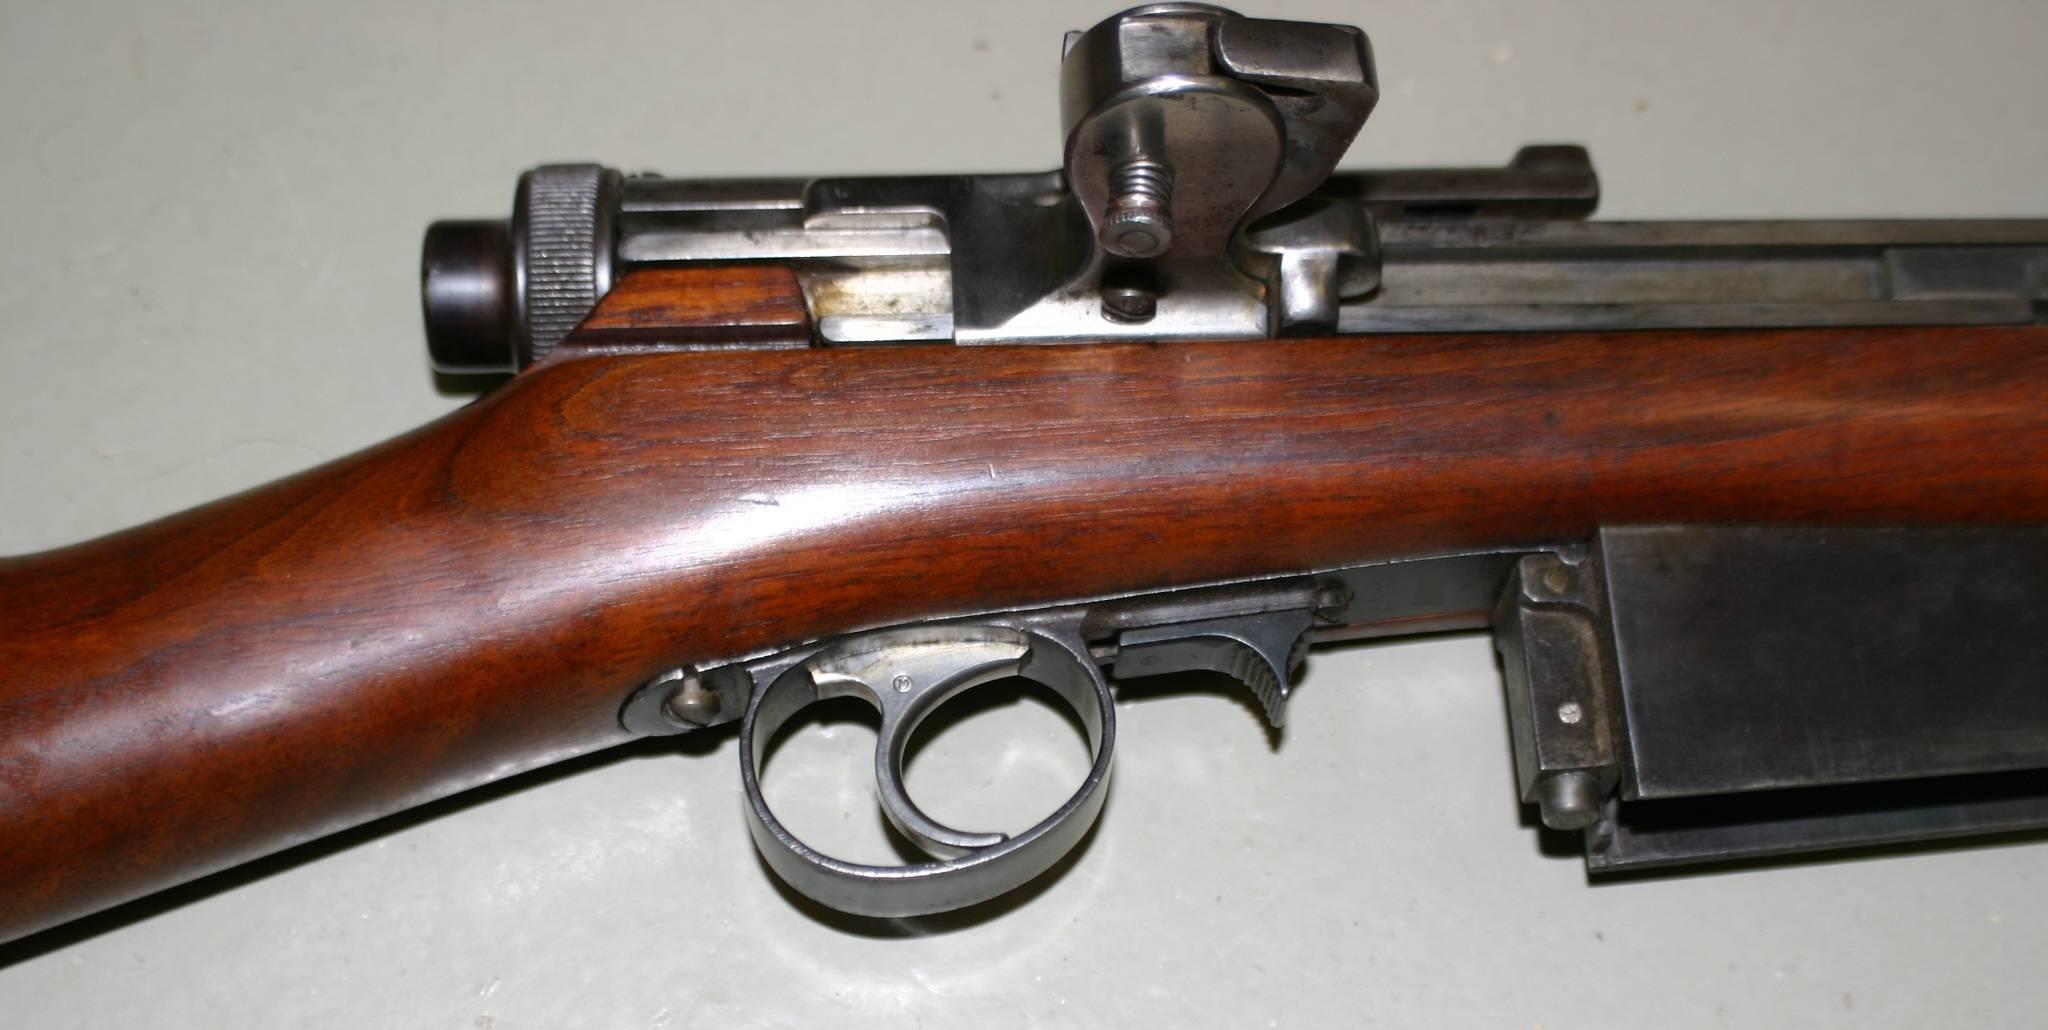 Мондрагон винтовка - mondragón rifle - qwe.wiki